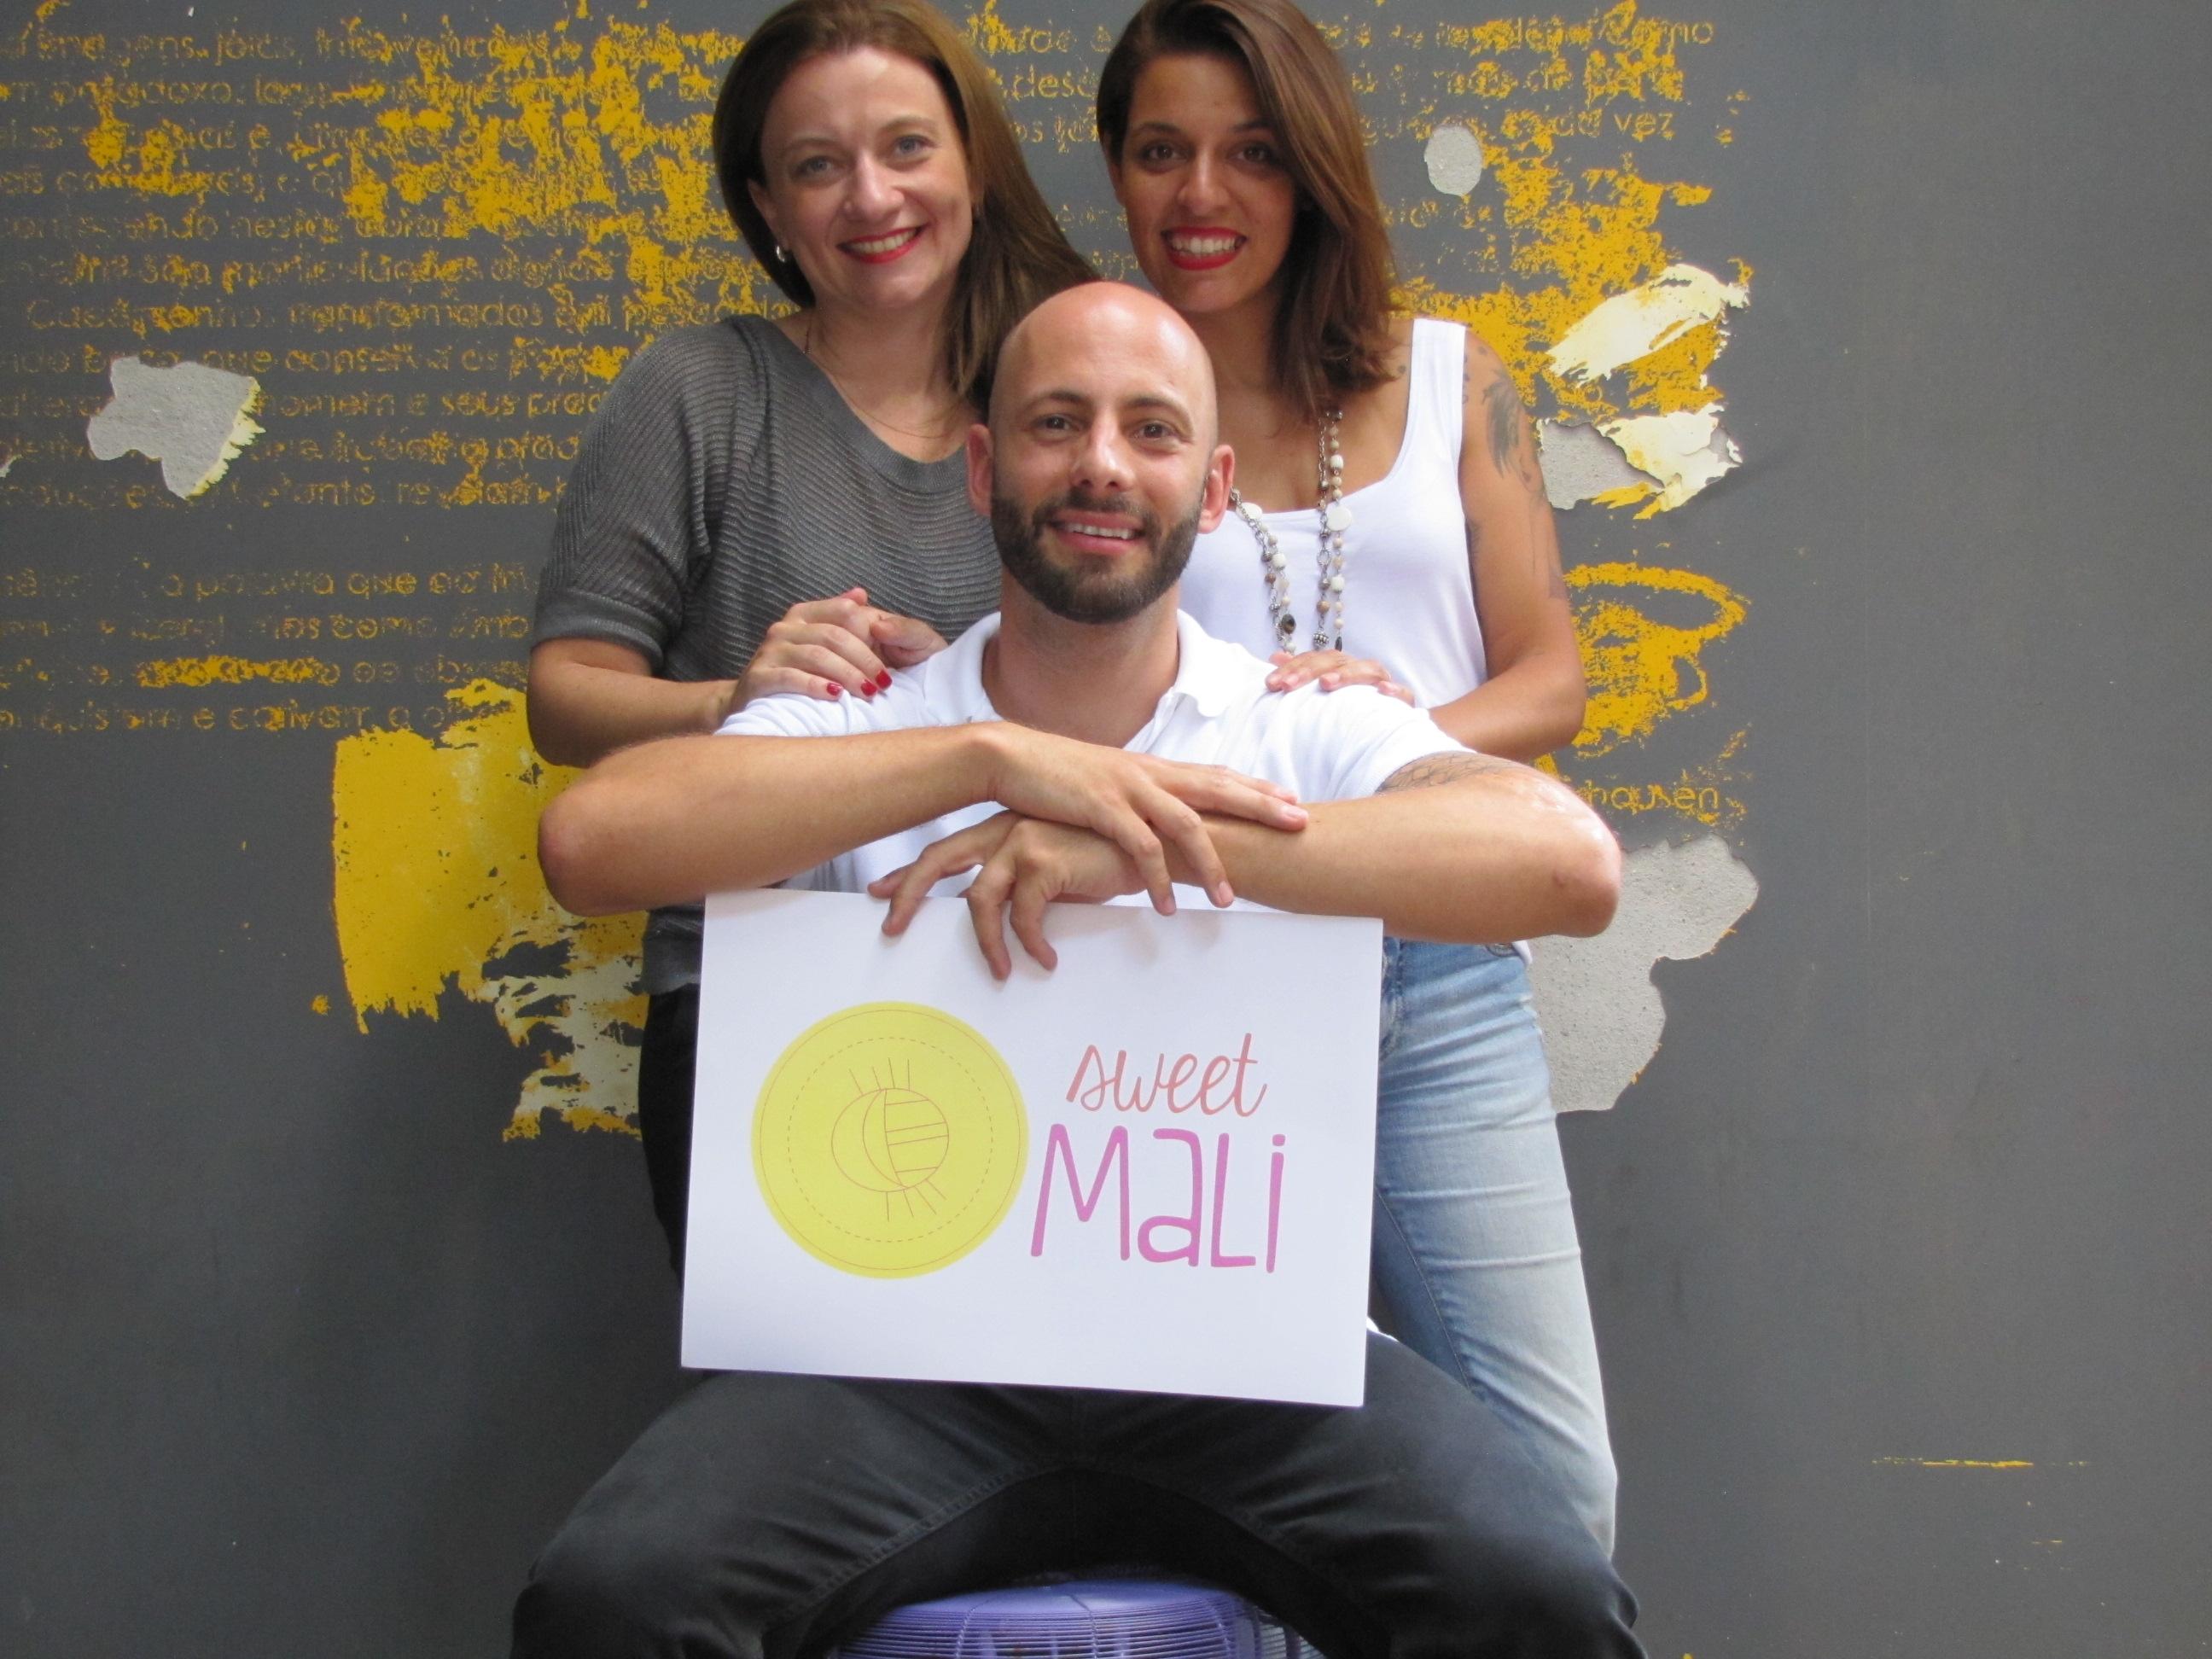 Sweet Mali